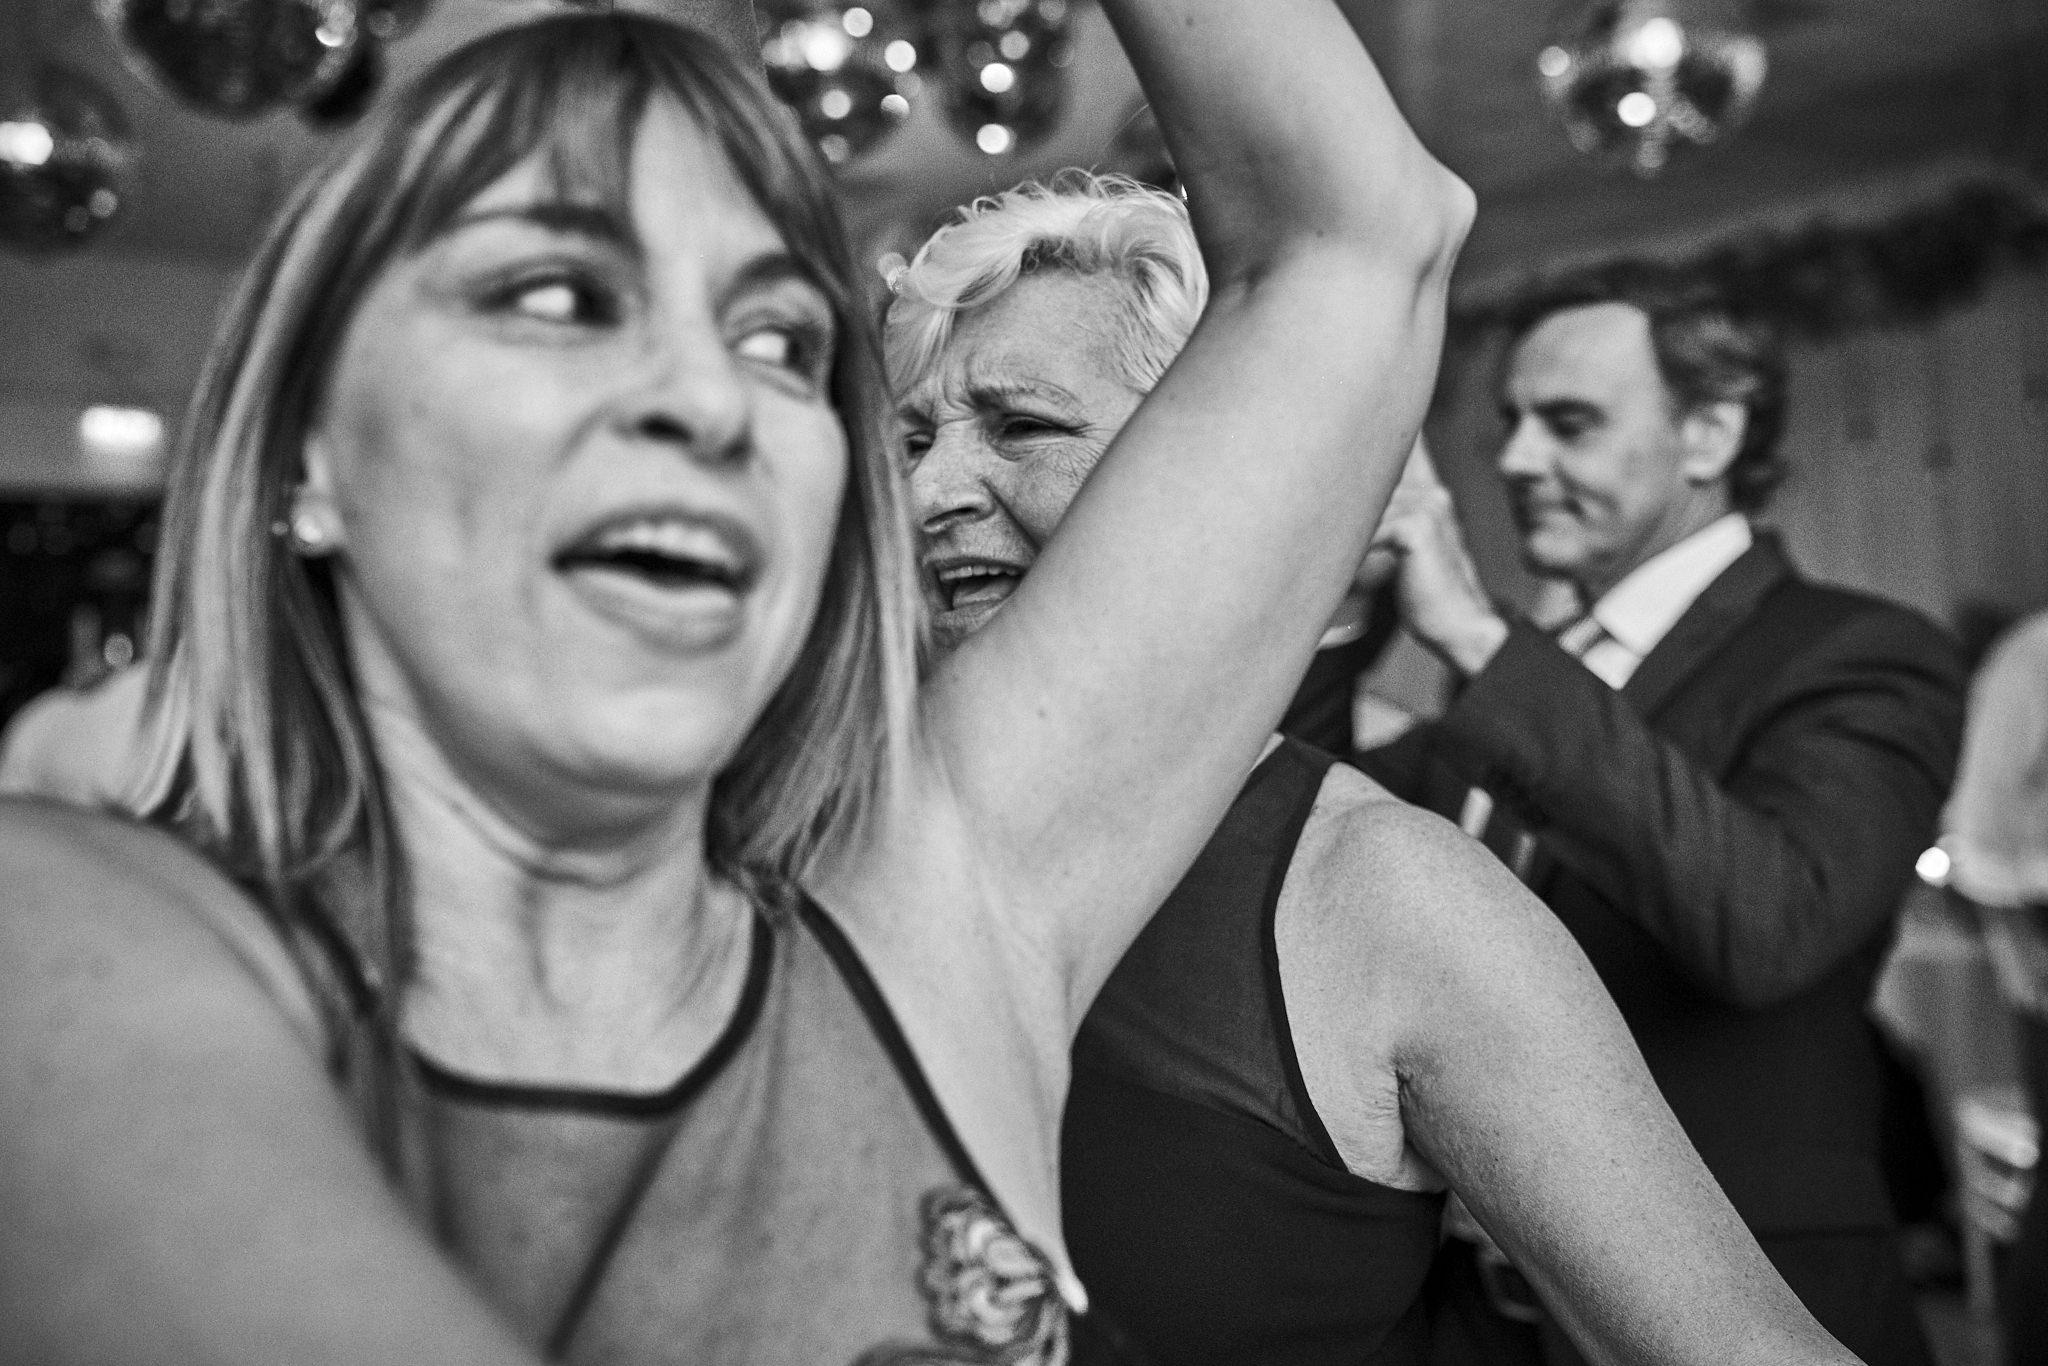 Fotografo Bodas Gays Barcelona LME07955.jpg